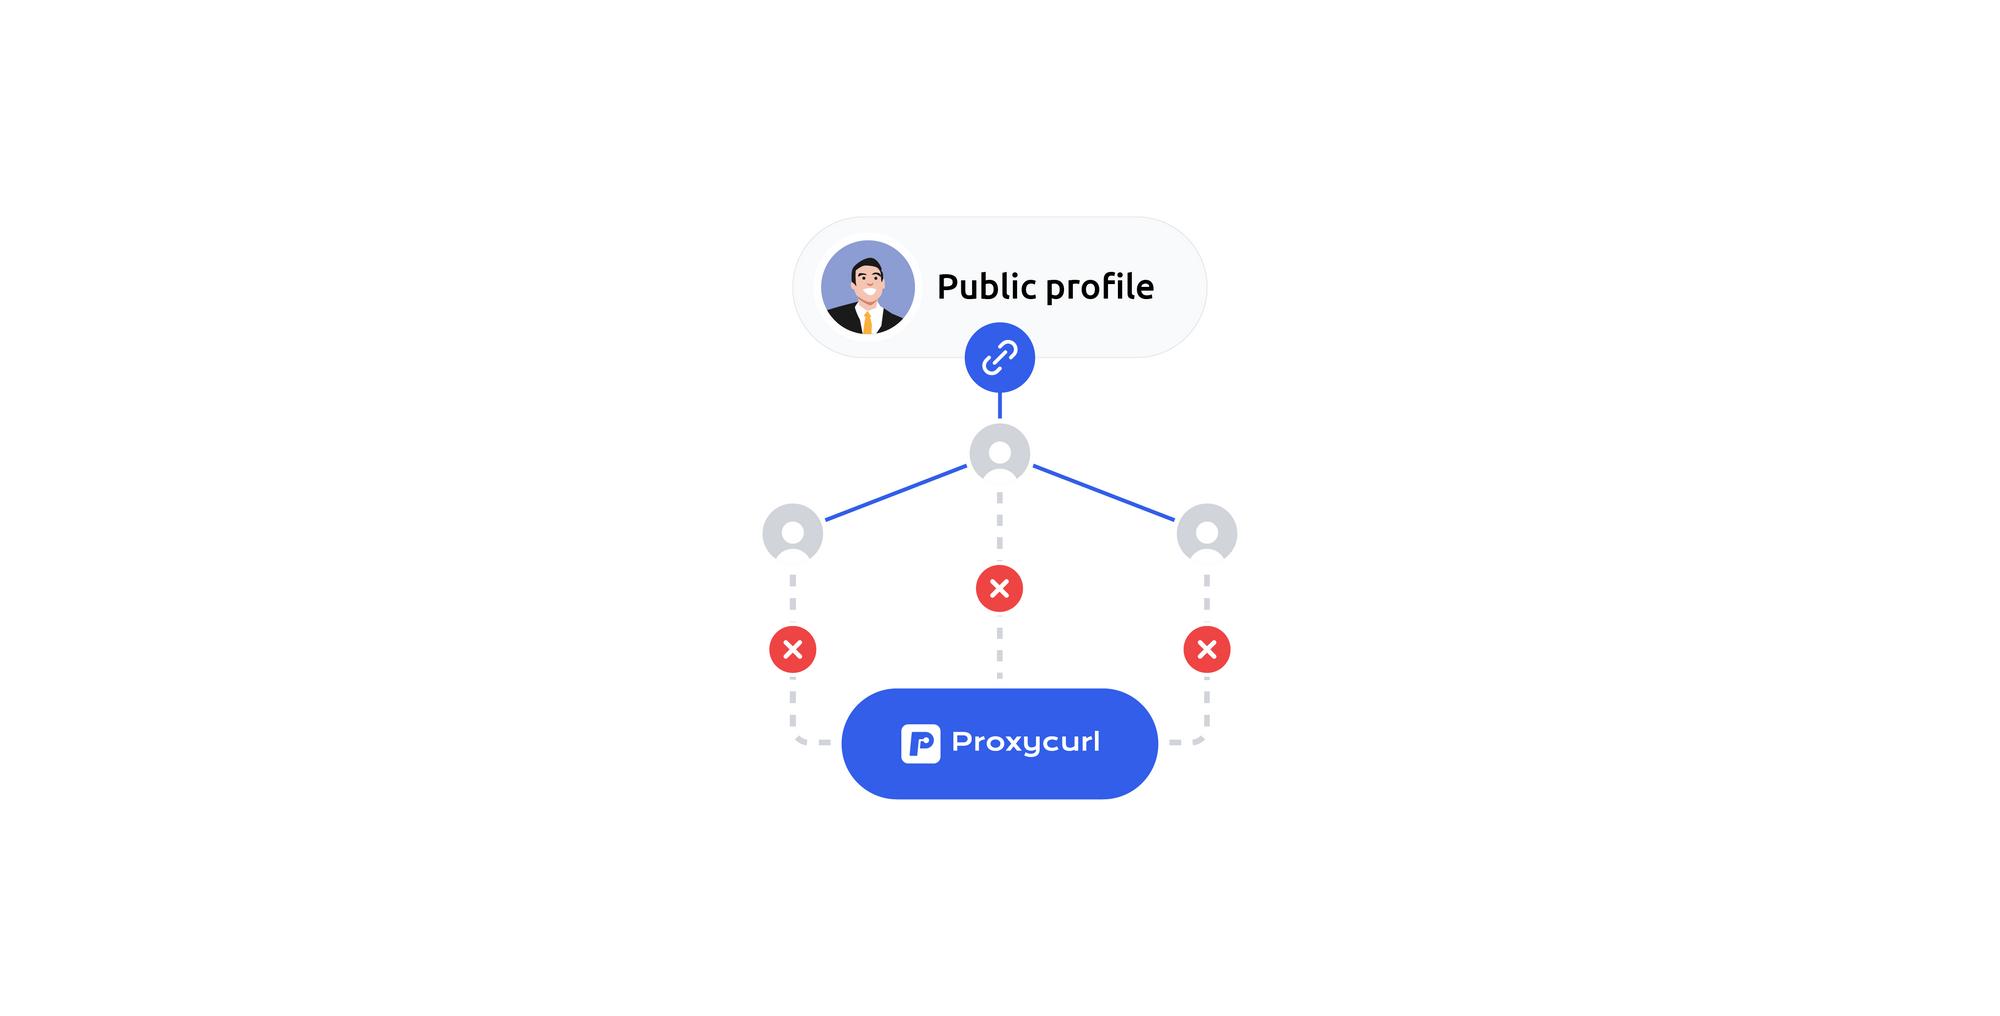 Can Proxycurl scrape LinkedIn profile connections?